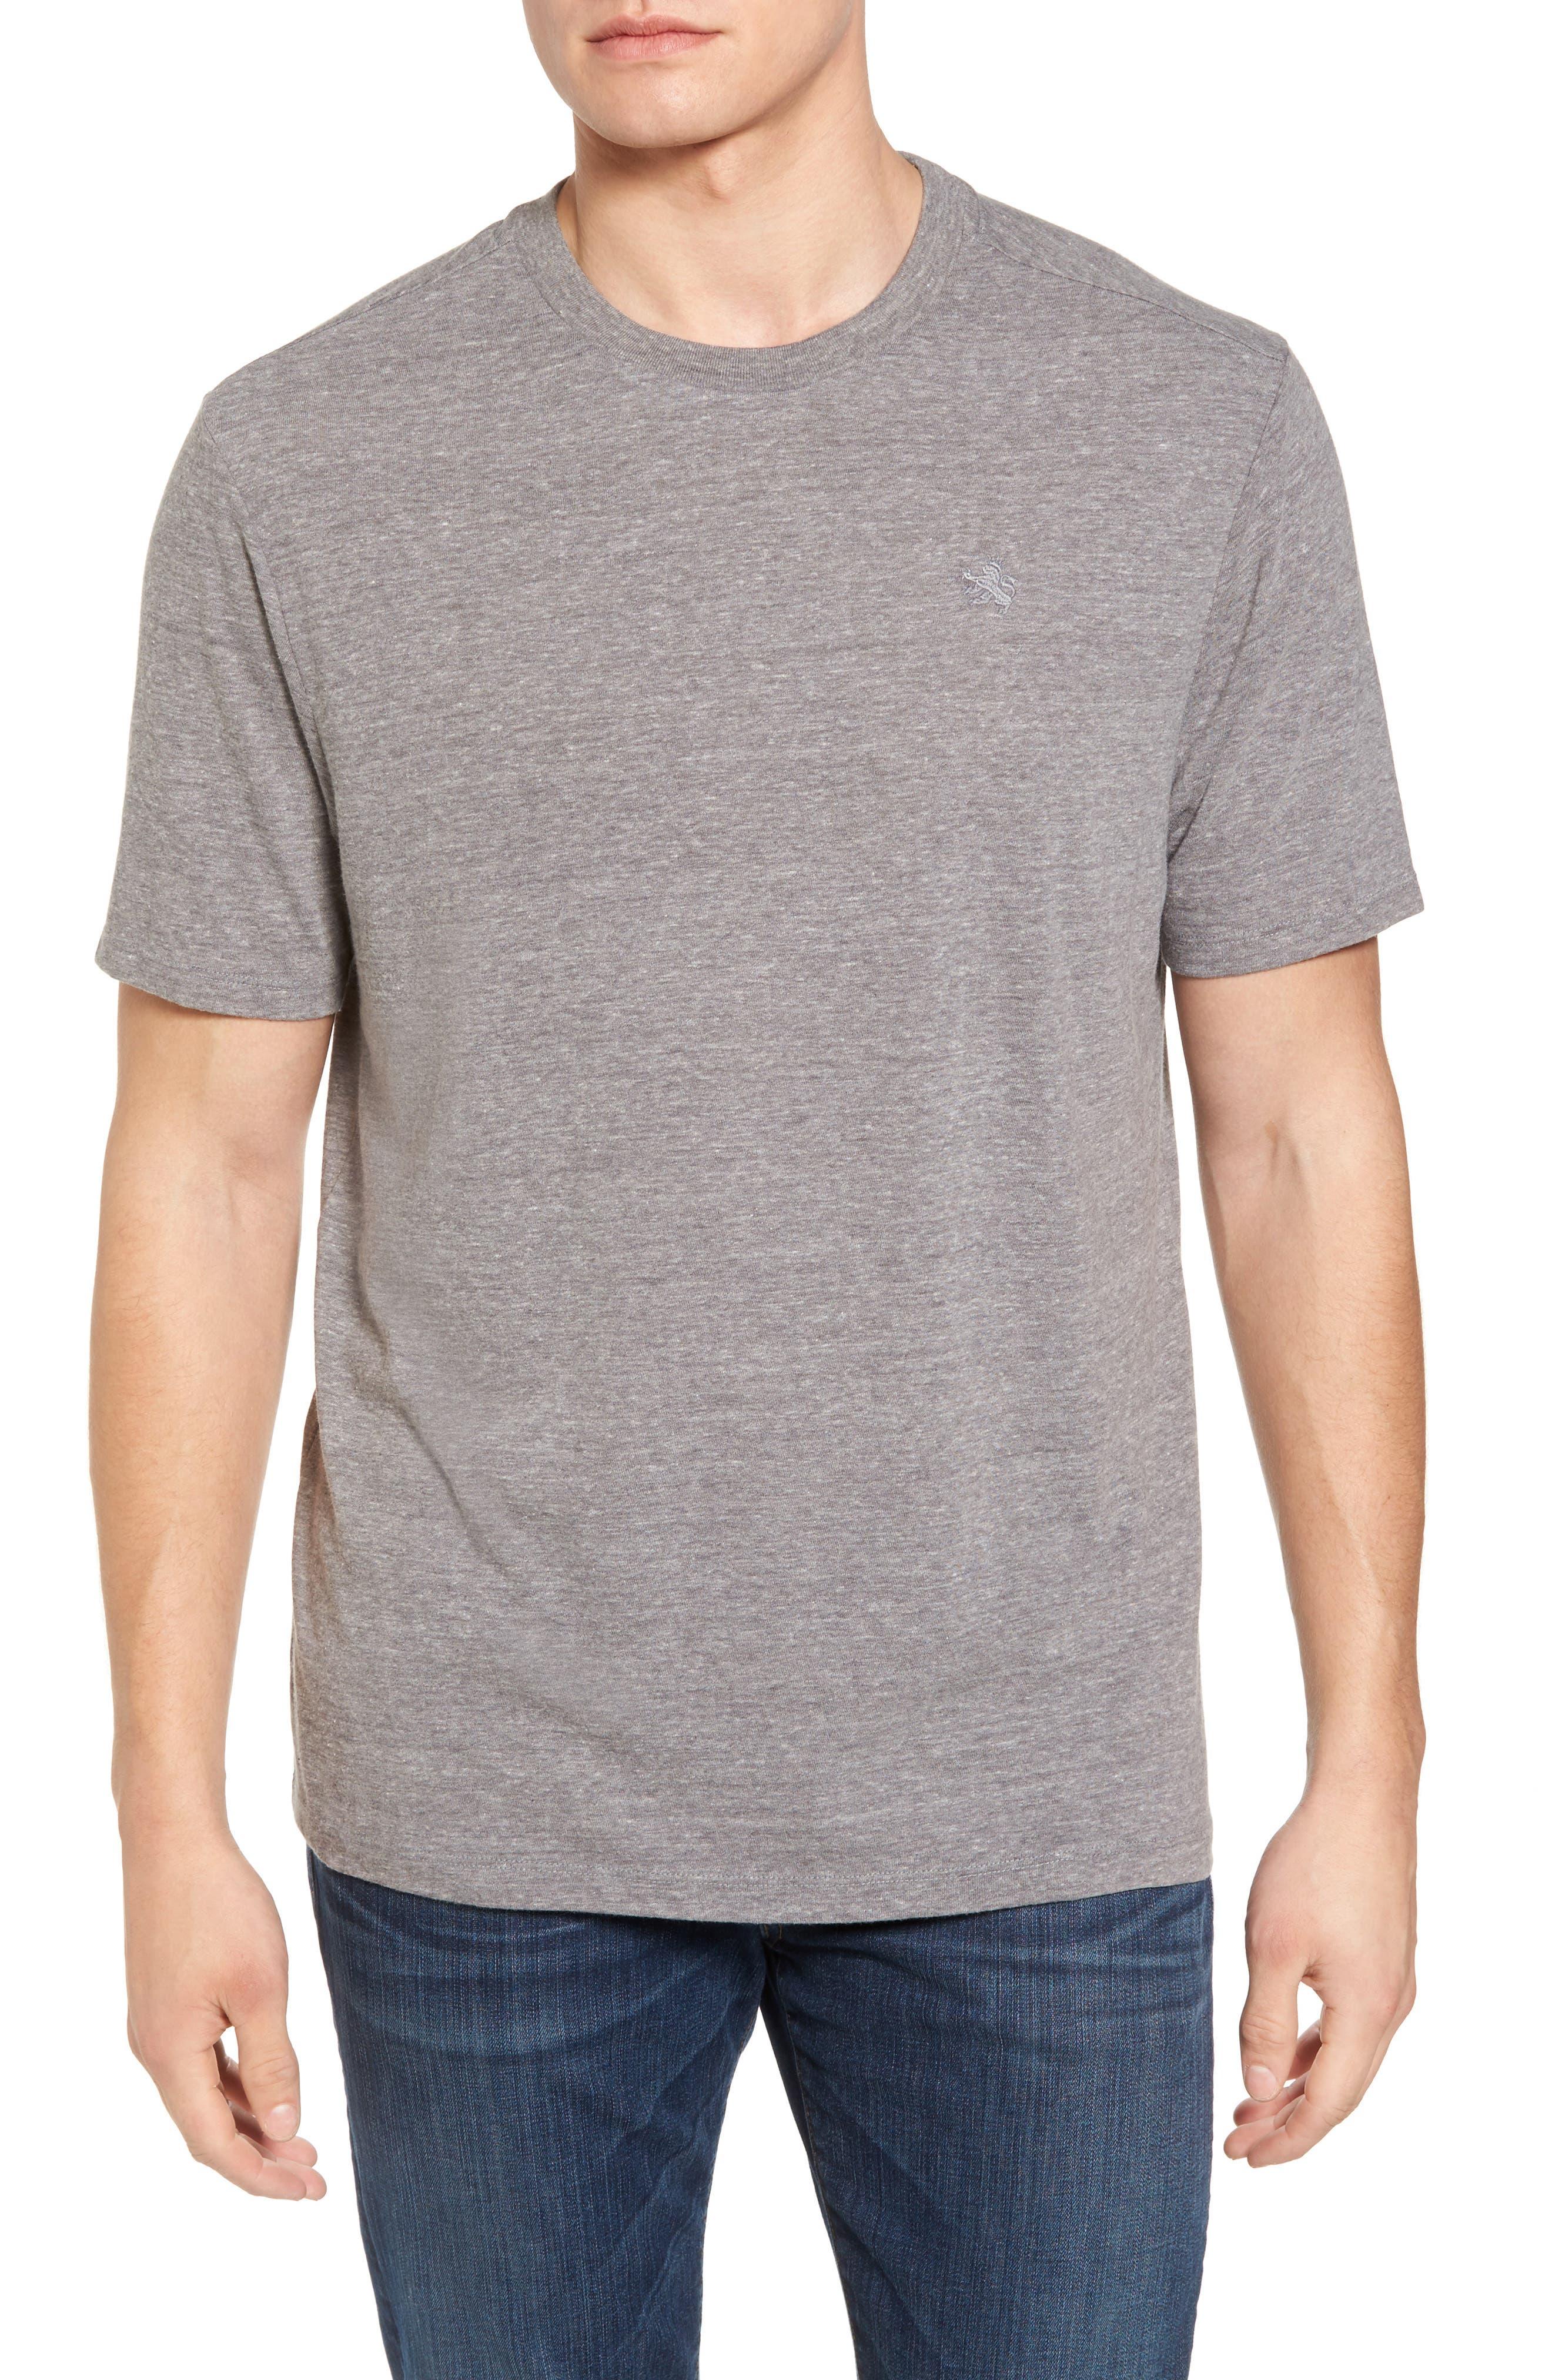 Nat Nast Parrots Cove Graphic T-Shirt